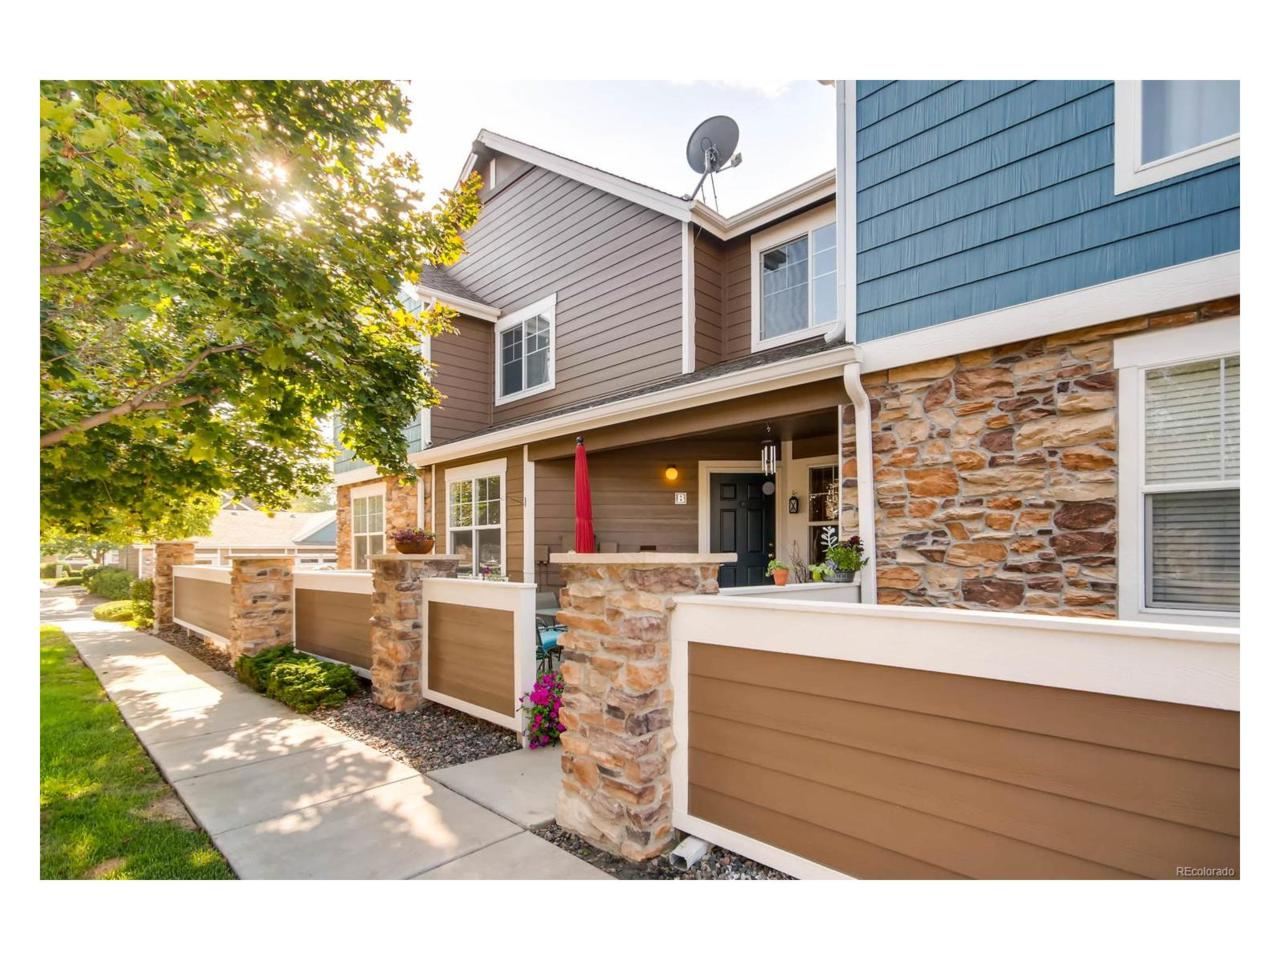 13283 Holly Street B, Thornton, CO 80241 (MLS #5522916) :: 8z Real Estate